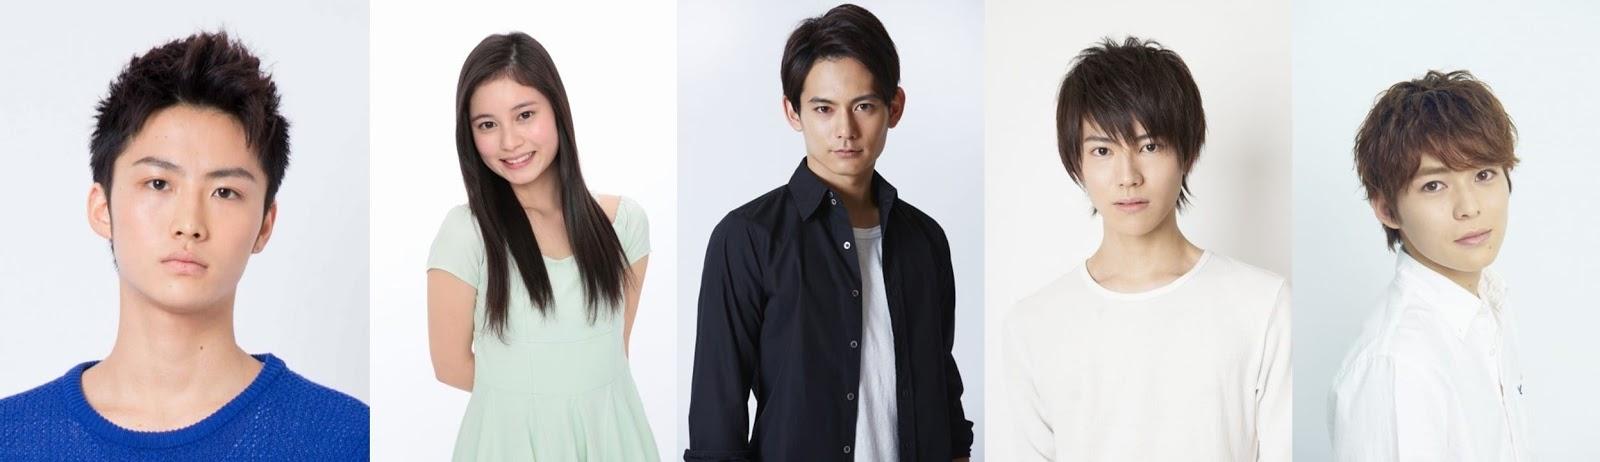 JEFusion | Japanese Entertainment Blog - The Center of